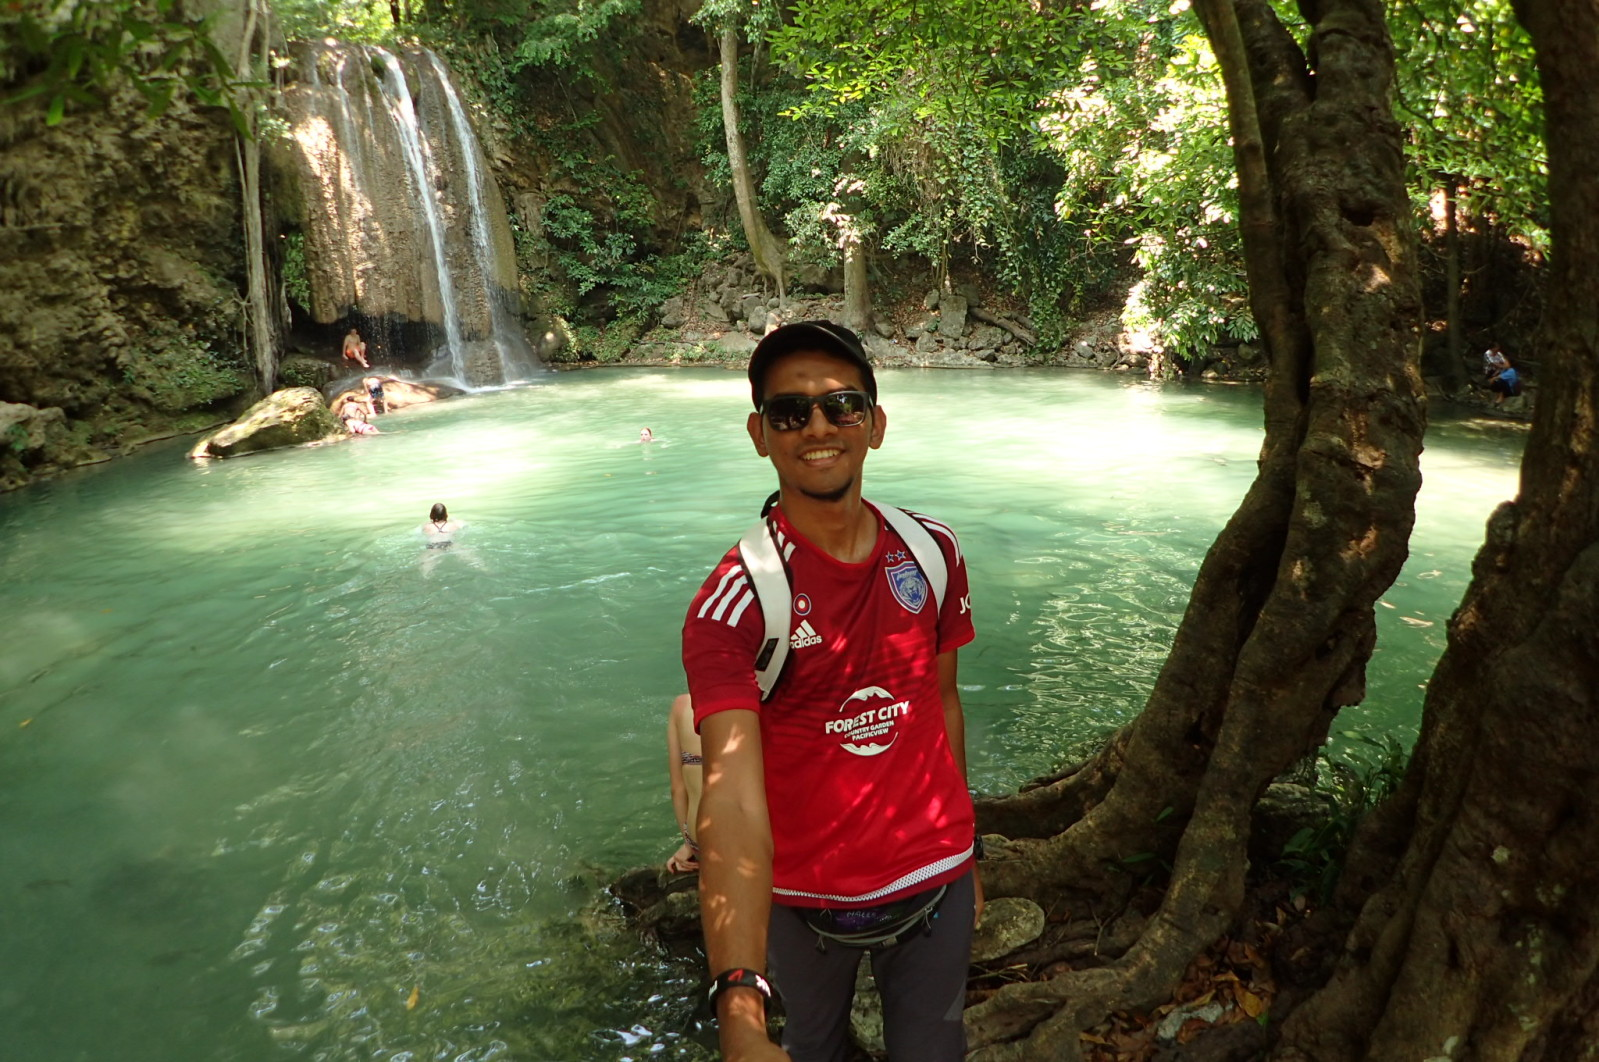 Erawan Falls ni cantik jugak. Tapi indah gambar dari rupa.